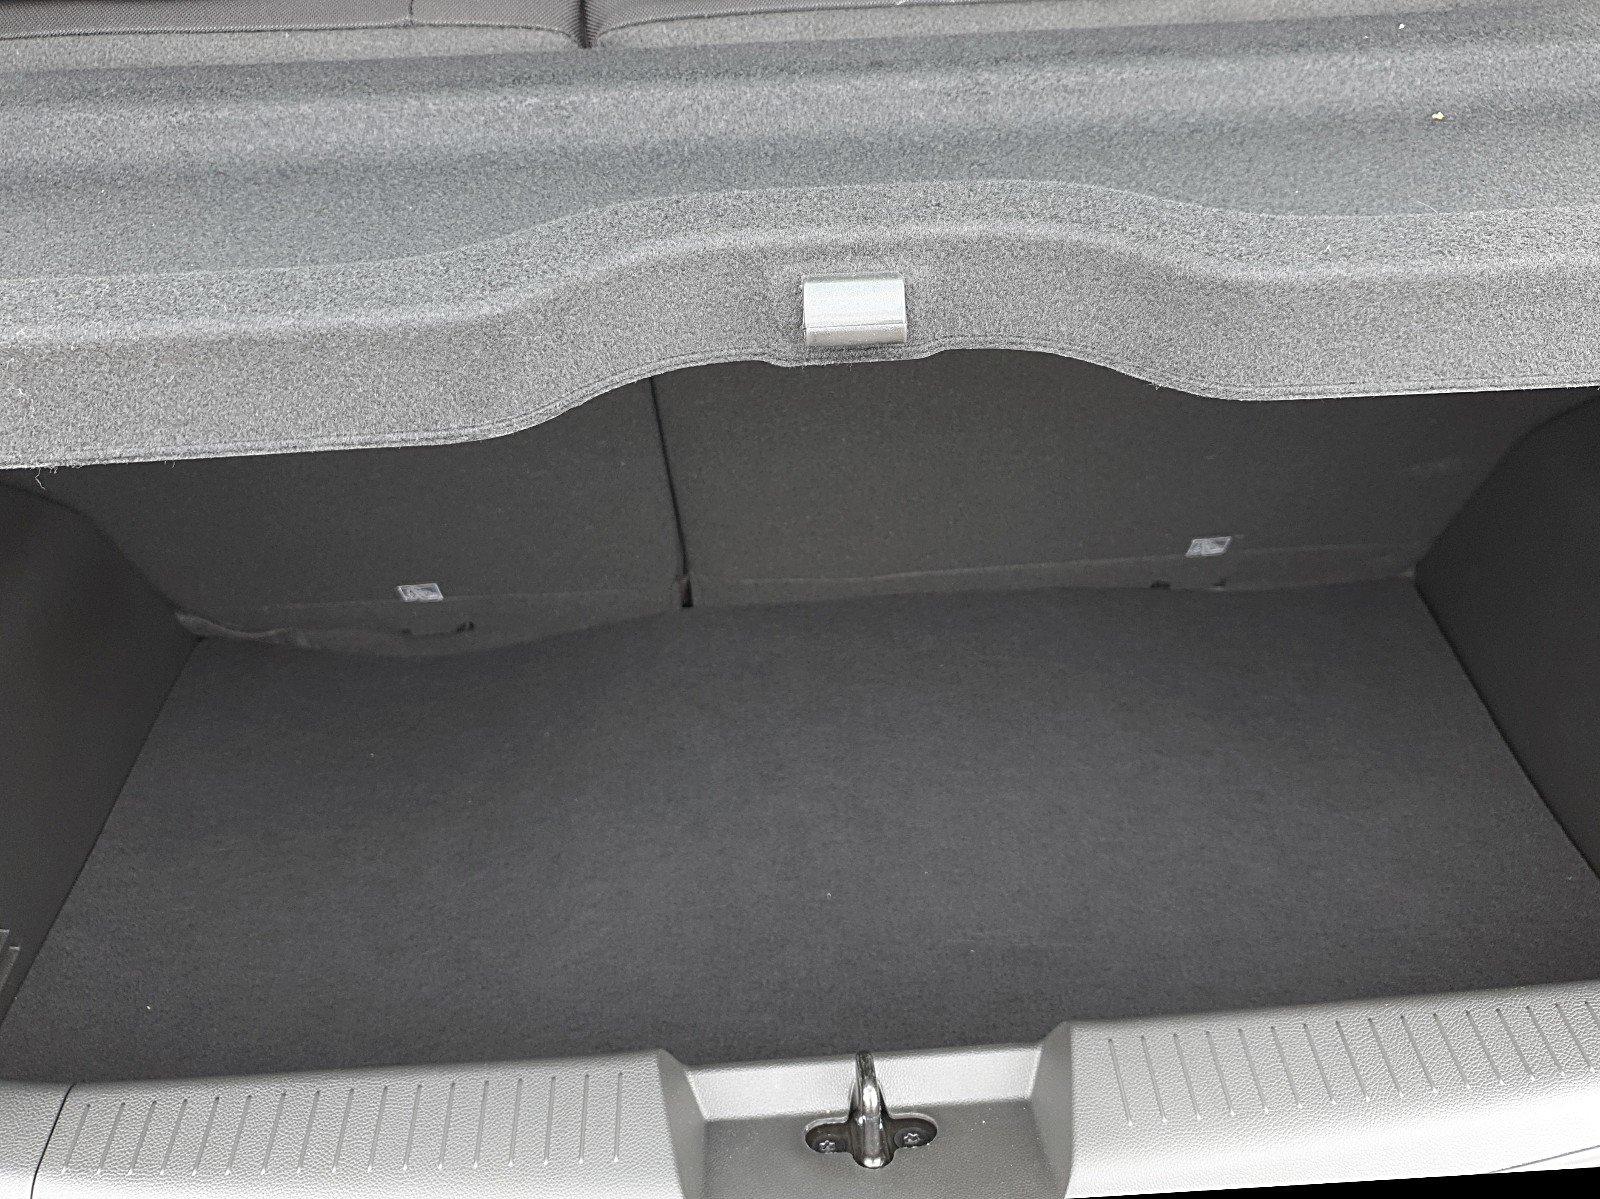 OPEL KARL 1.0 73PS 120 Jahre 5-Türig Klima PDC Nebelsch. Bluetooth Temp 5- Viscaal Fahrzeuggrosshandel GmbH, D-49847 Itterbeck